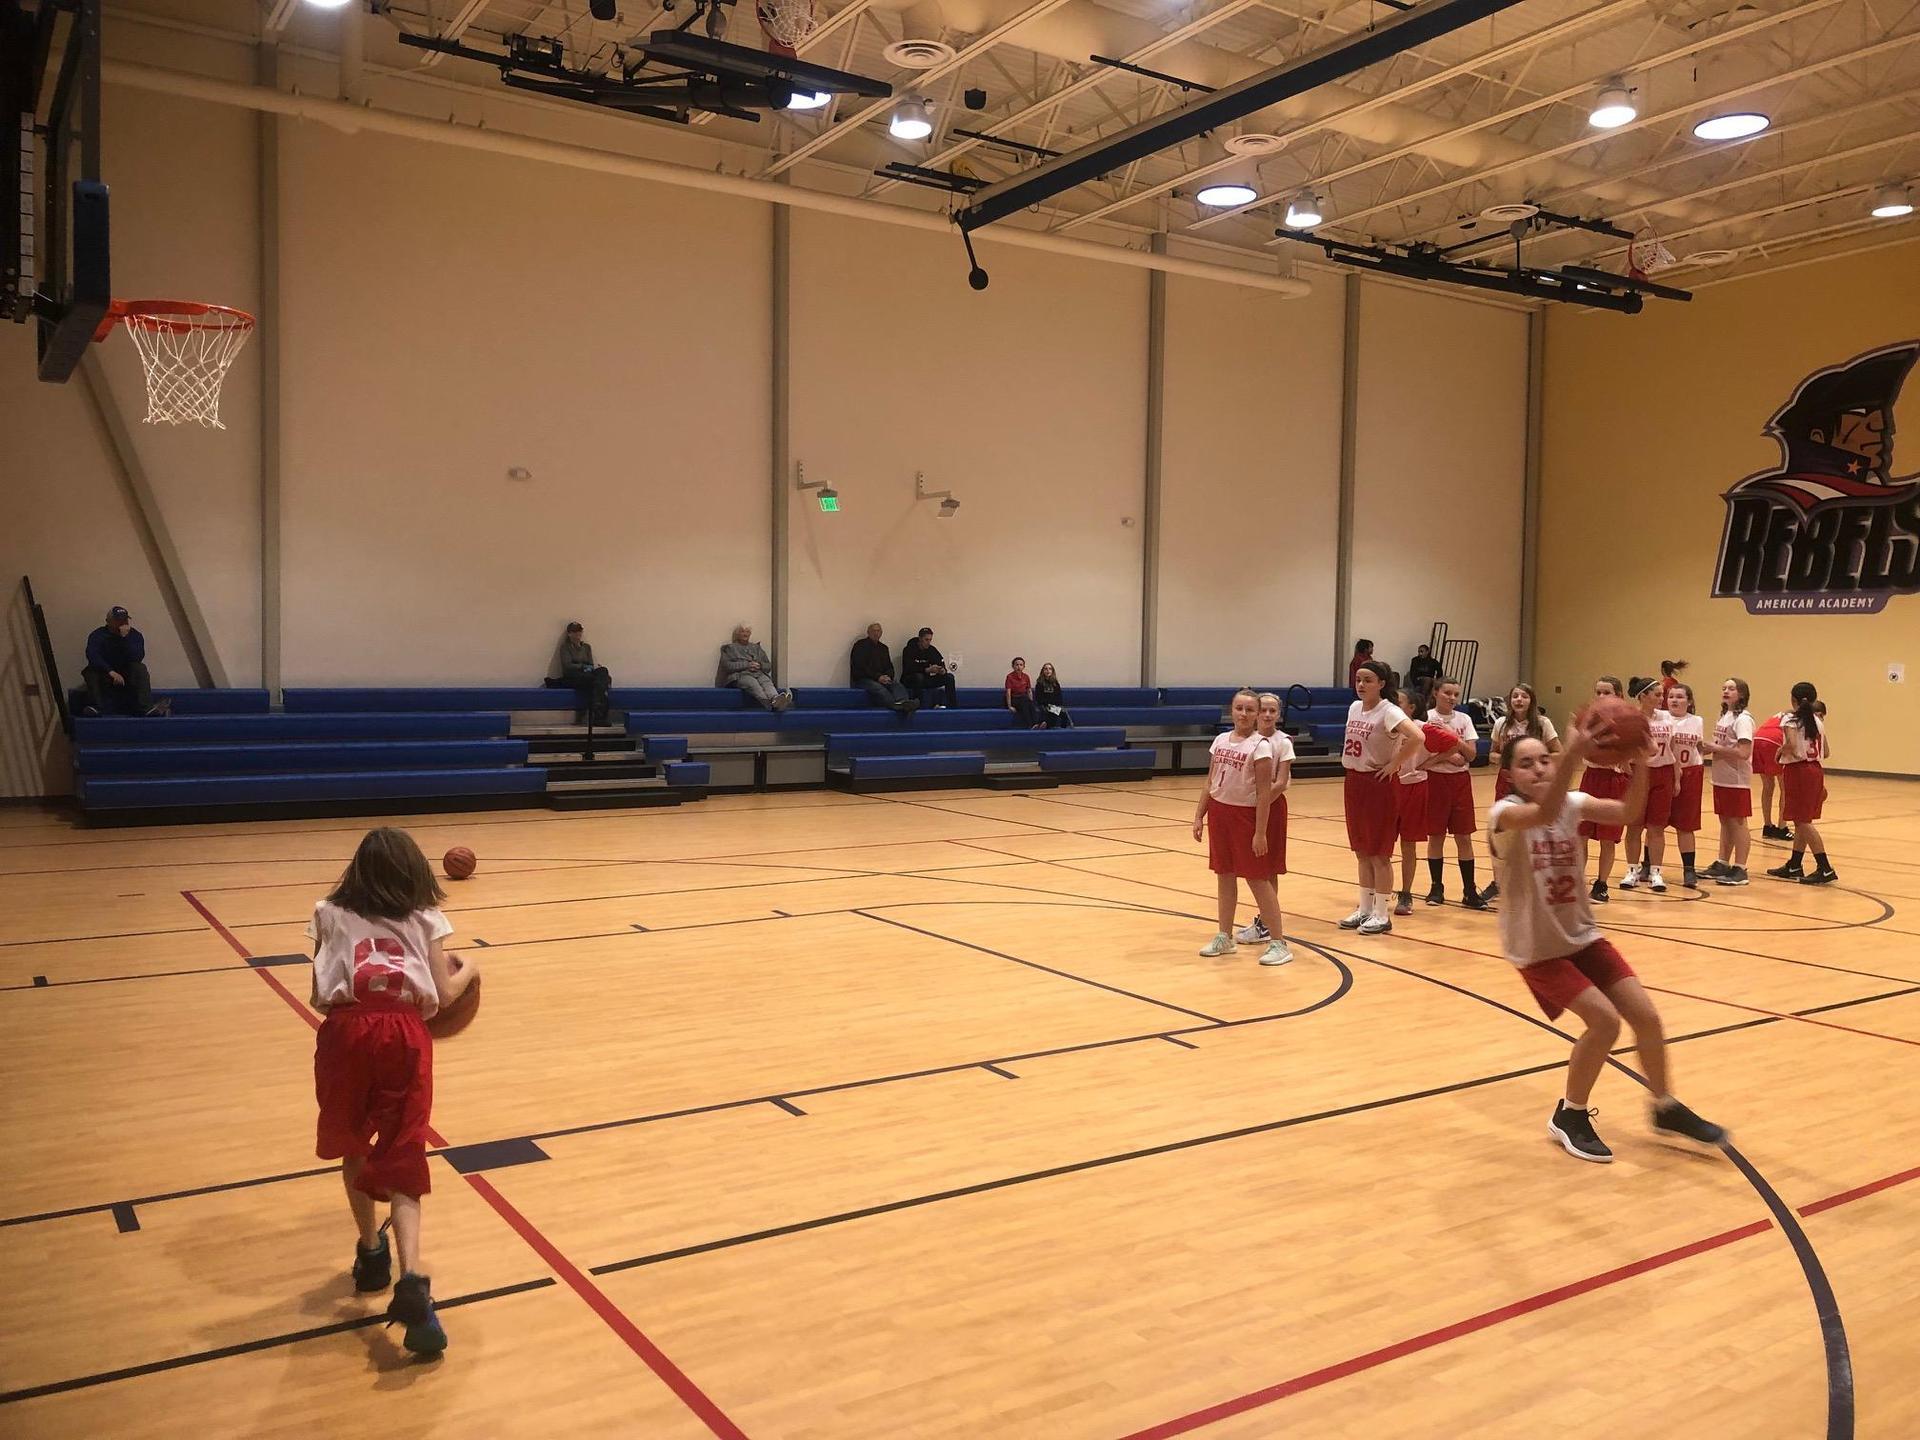 Girls basketball players warming up